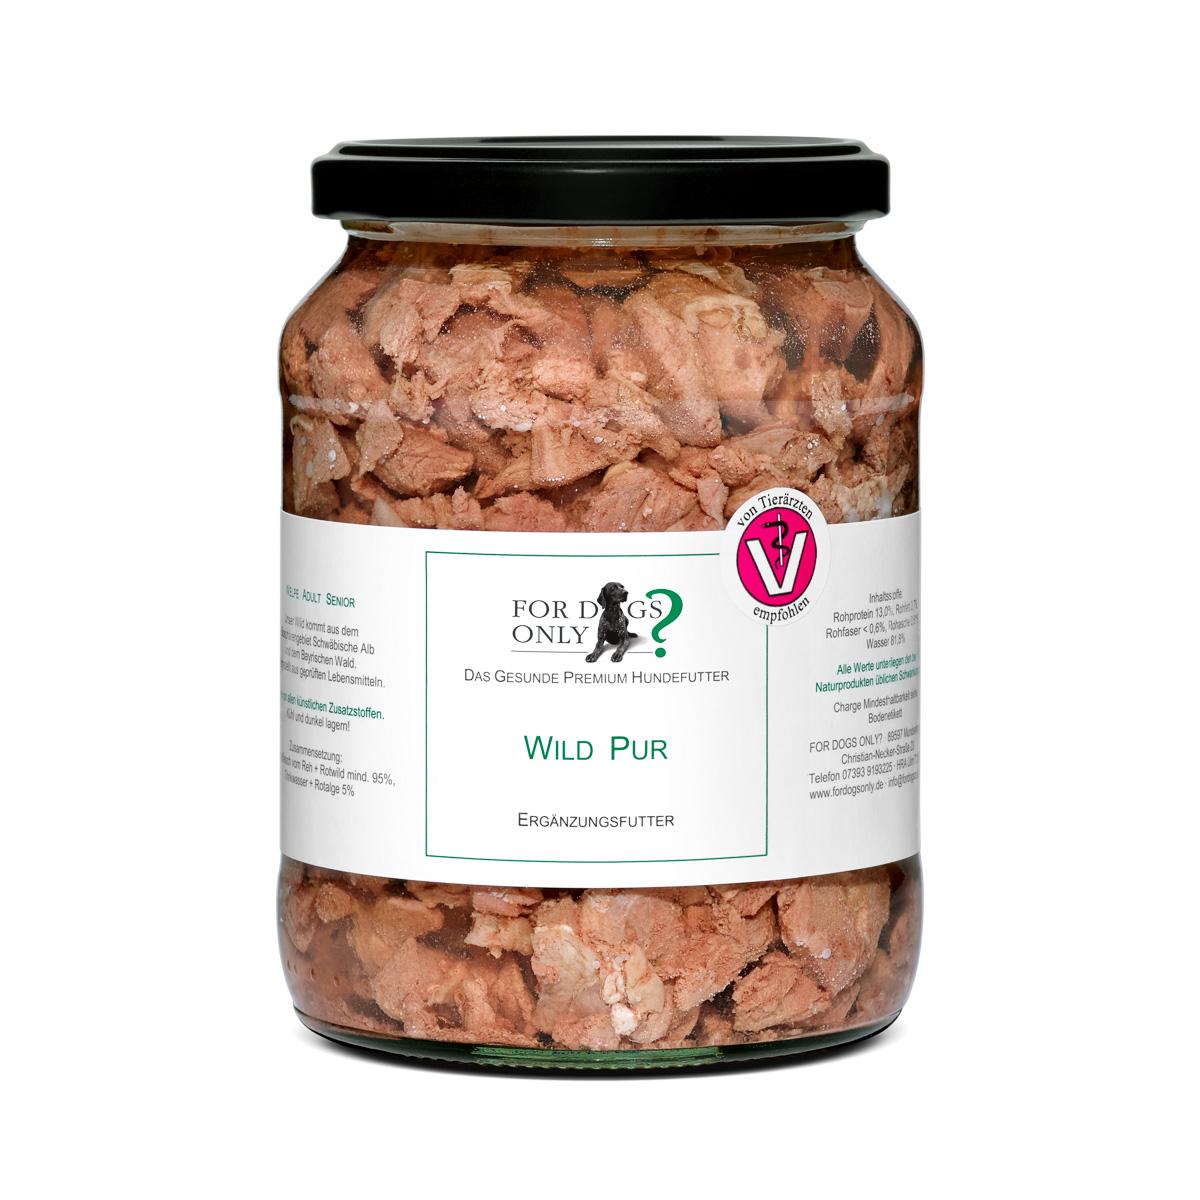 Premium Hundefutter Wild Pur